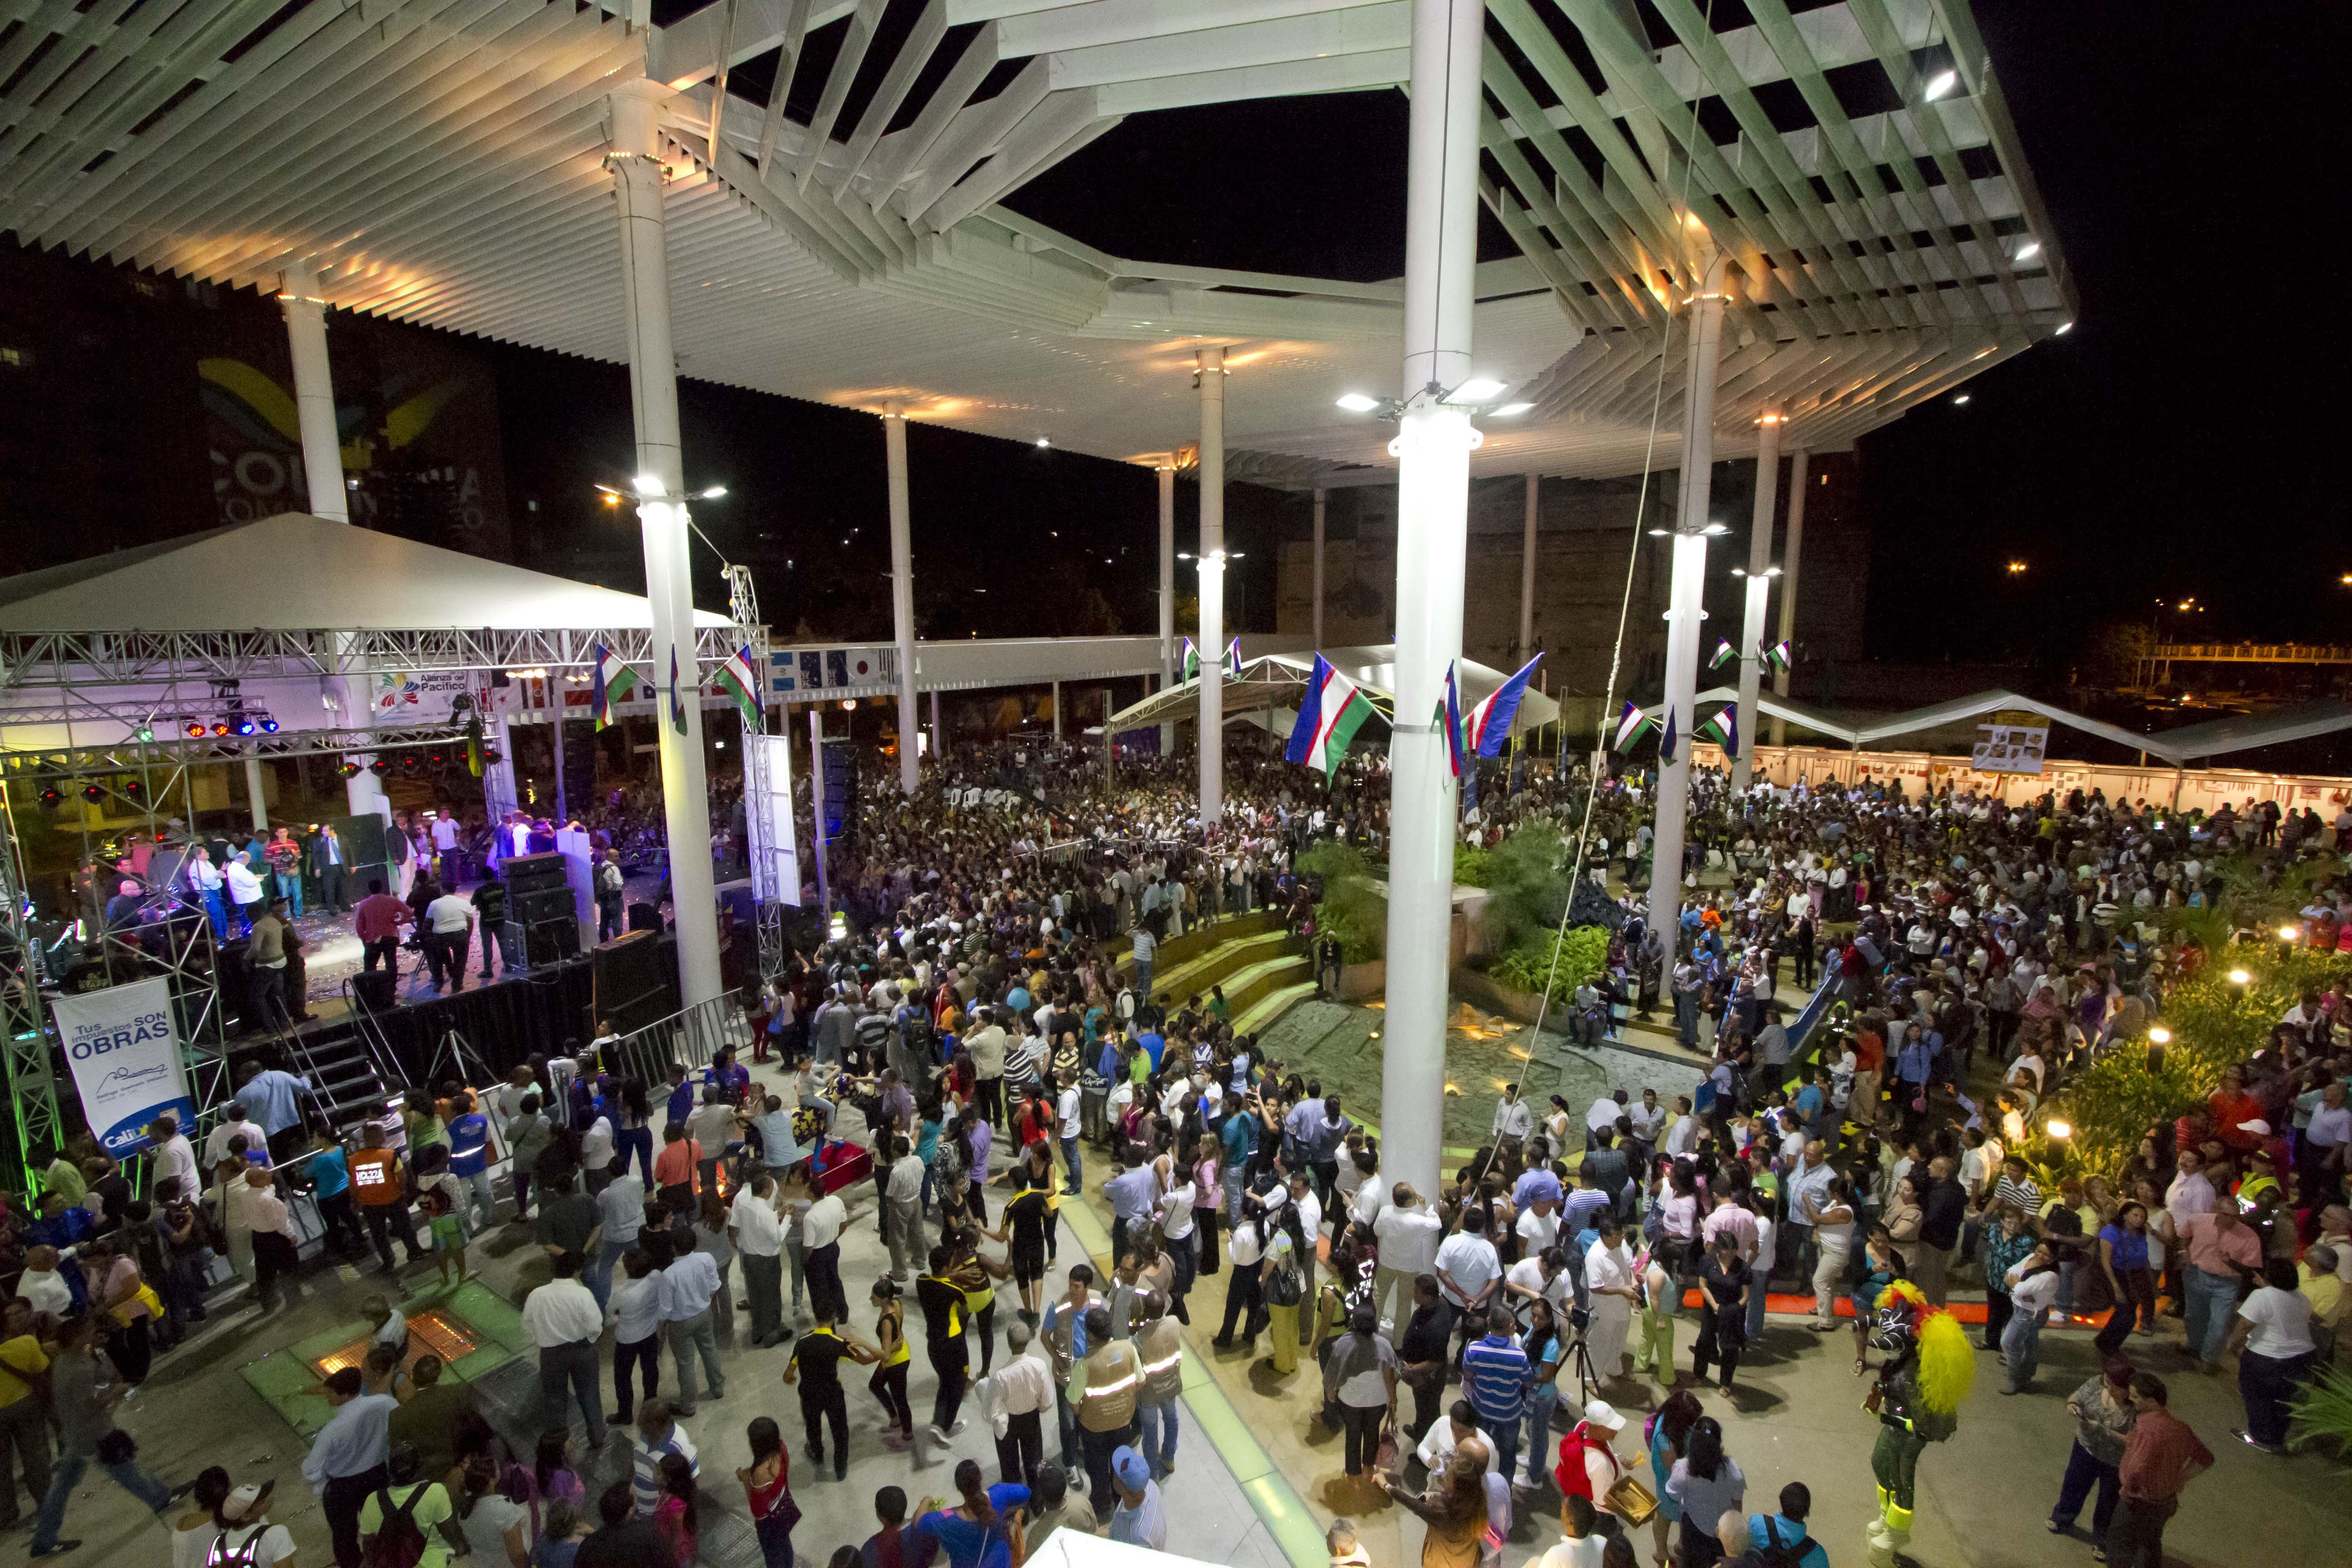 La Plazoleta Jairo Varela dispondrá de diferentes actividades culturales durante los JJ. MM